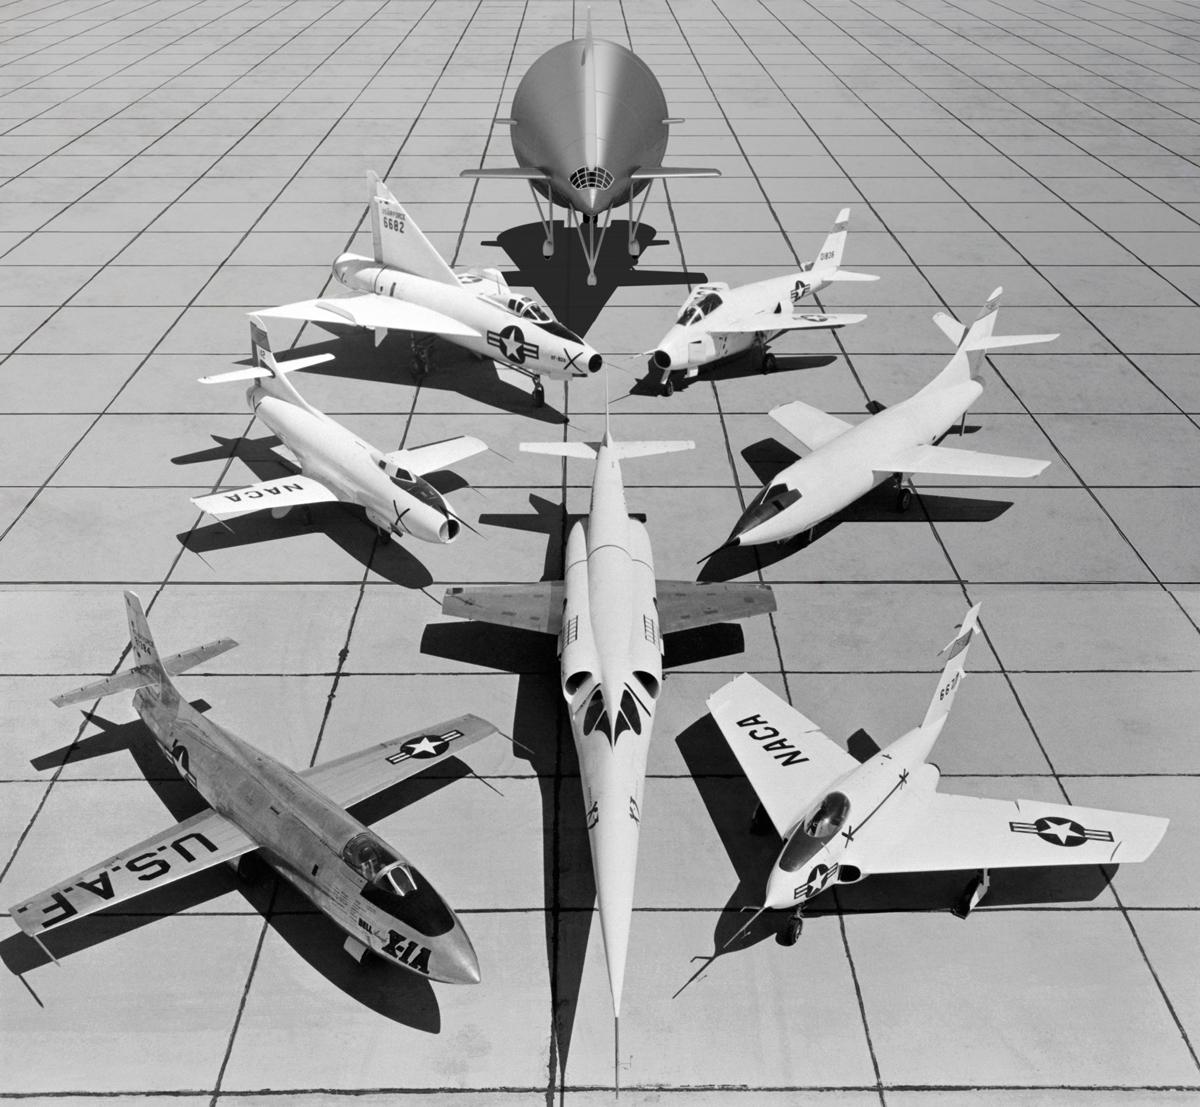 x1-sb-with-xplanes-1200